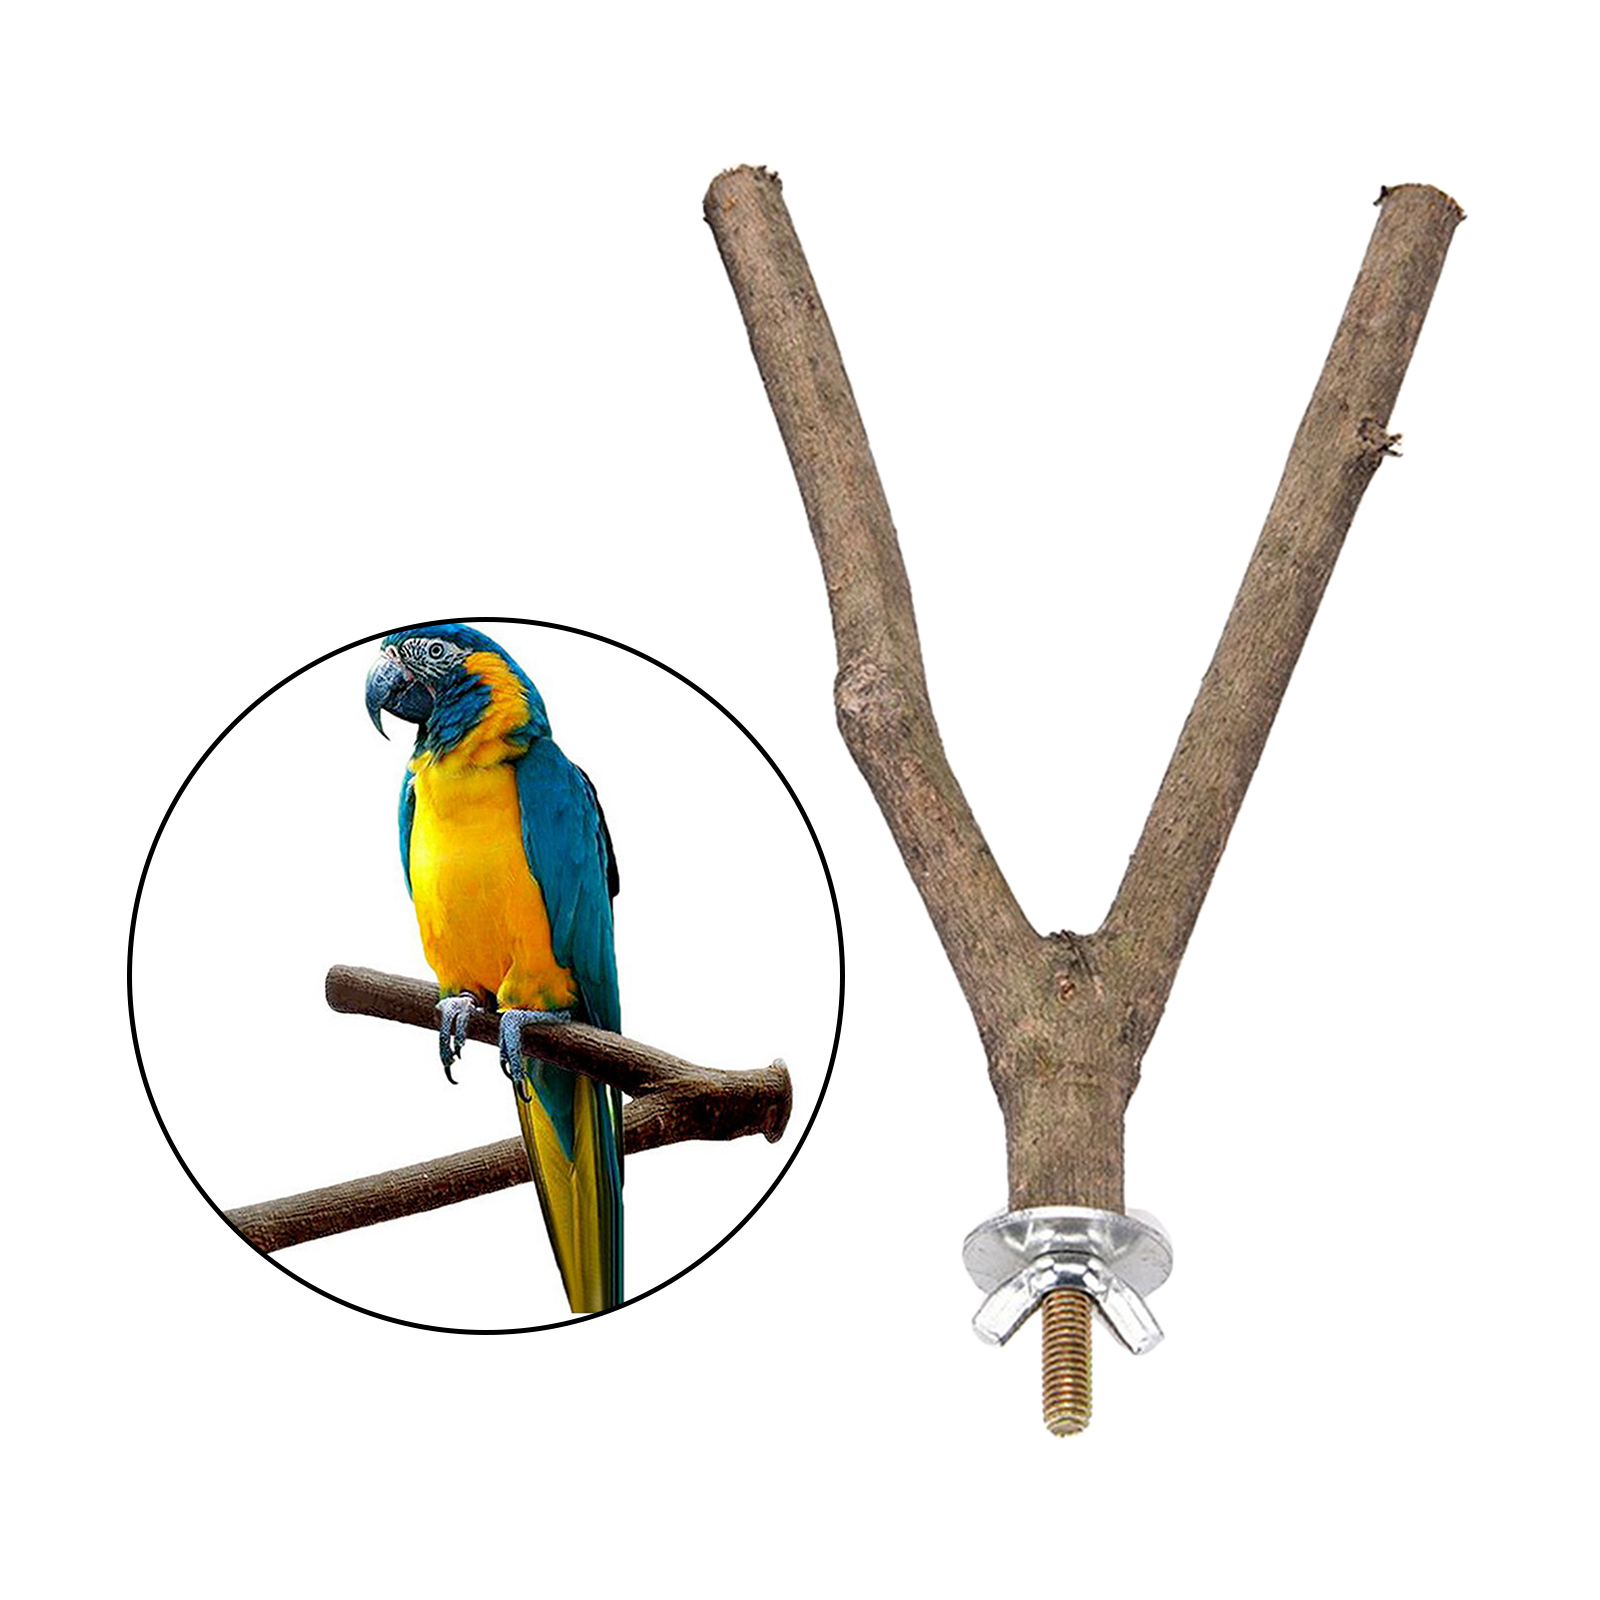 thumbnail 8 - Bird-Perch-Wood-Stand-Bird-Cage-Swing-Branch-for-Parrot-Parakeet-Cockatiel